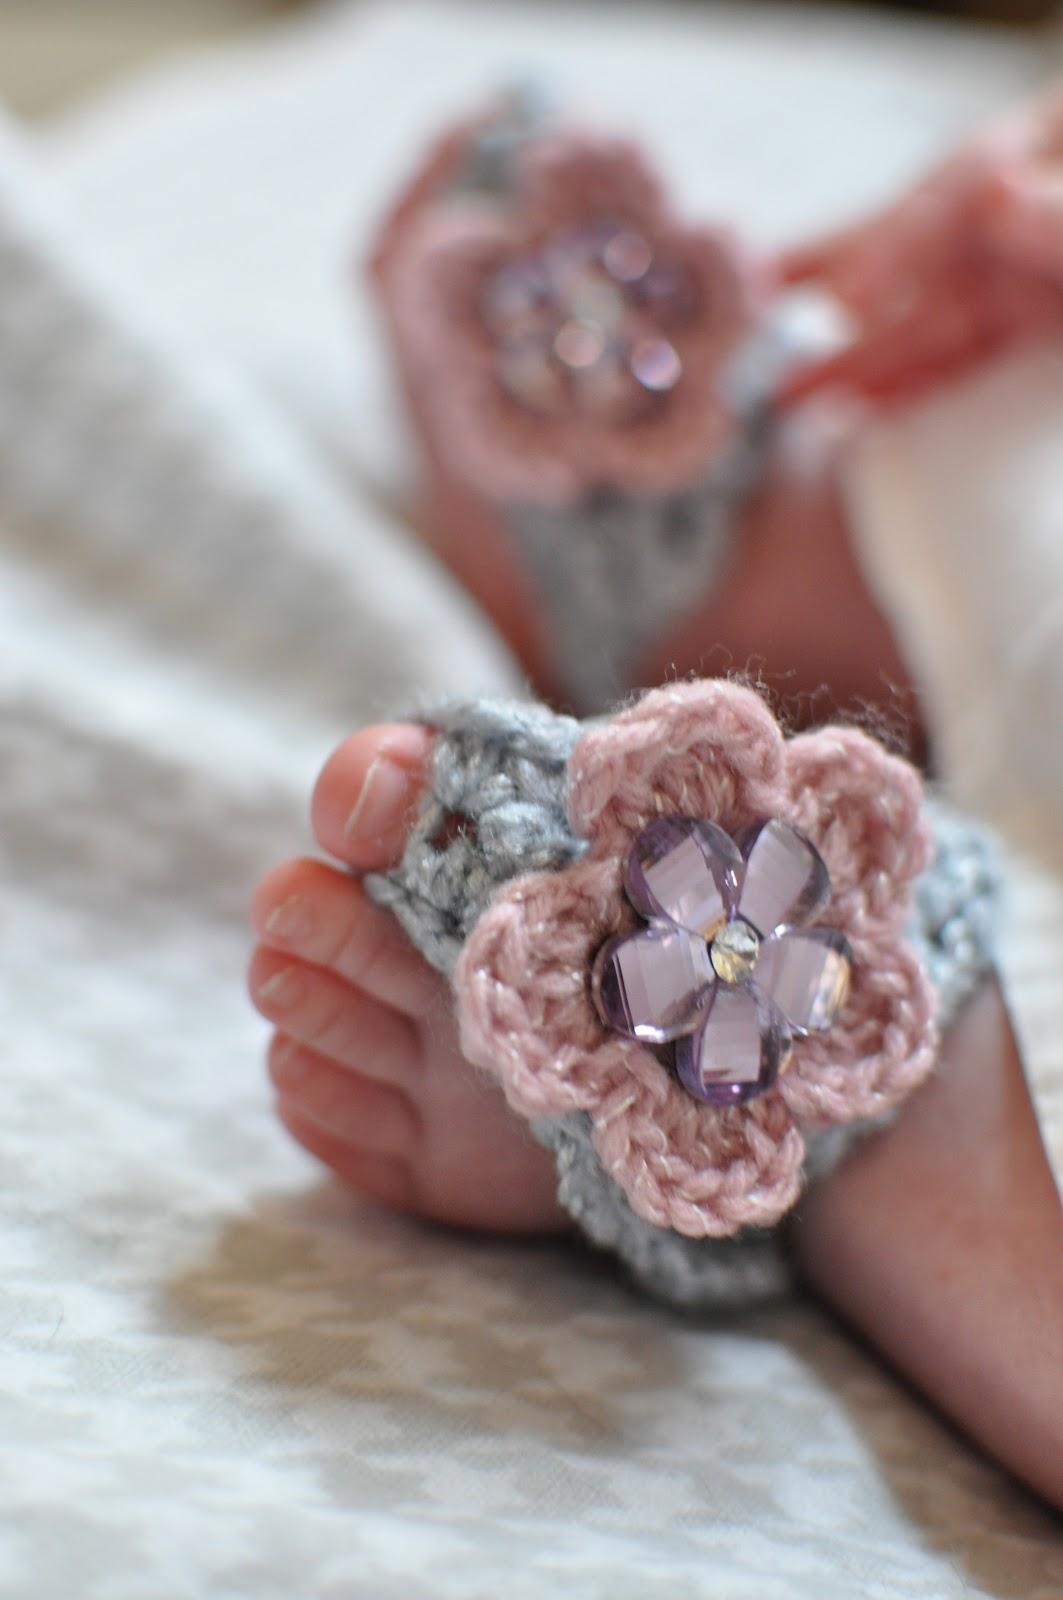 Simple Crochet Patterns For Baby Booties : Studio Bees & Appletrees: gehaakte baby slippertjes uitleg ...